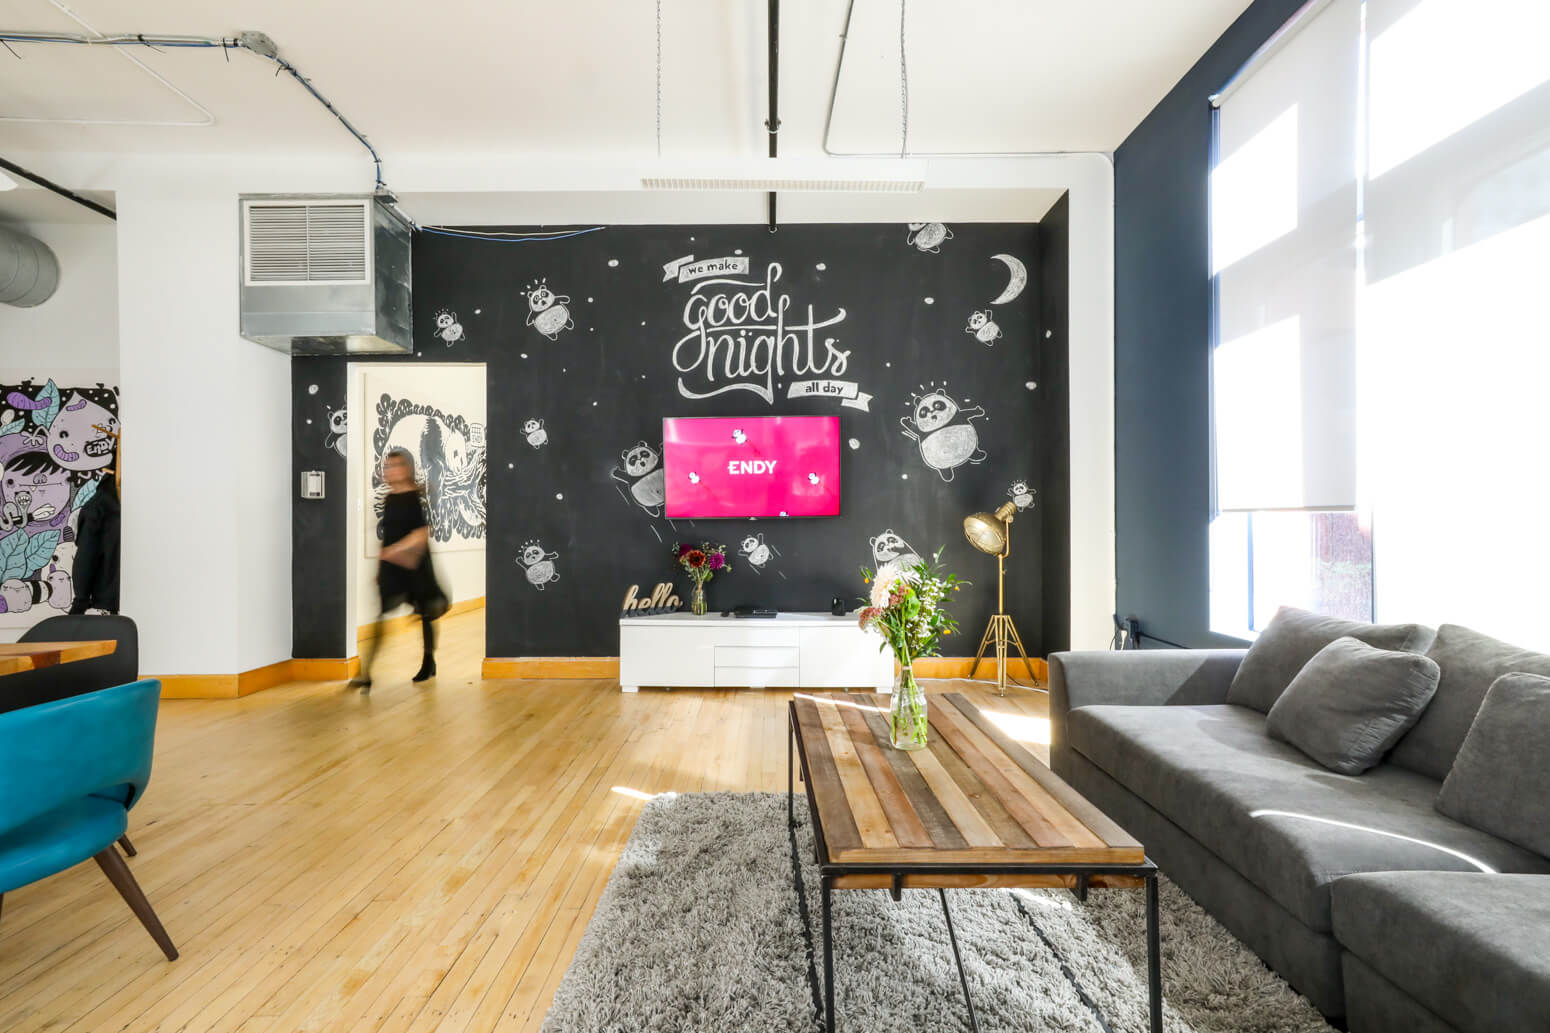 Endy Sleep Office Techvibes-4